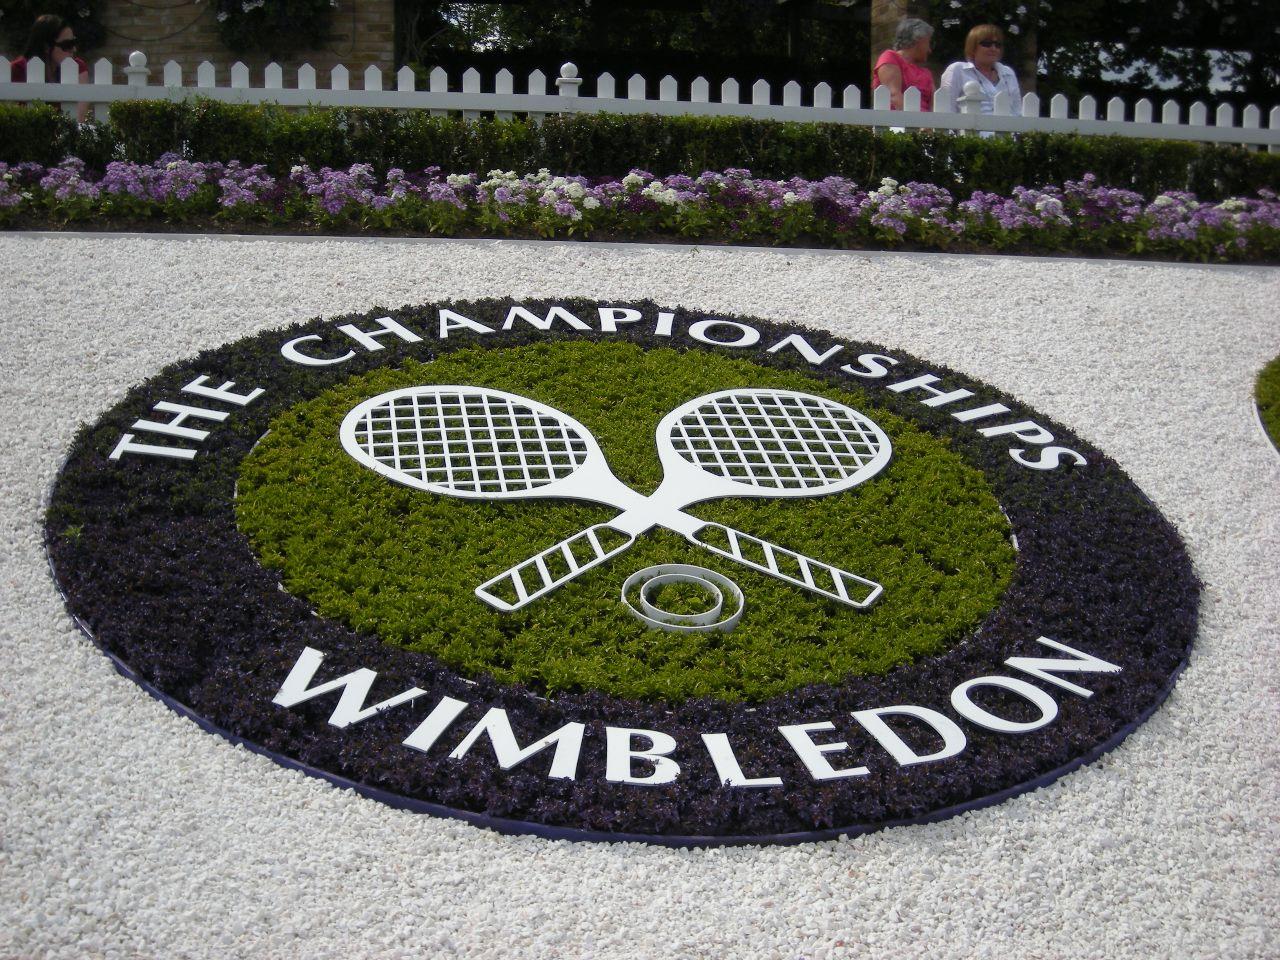 tennis fans club wimbledon championship. Black Bedroom Furniture Sets. Home Design Ideas